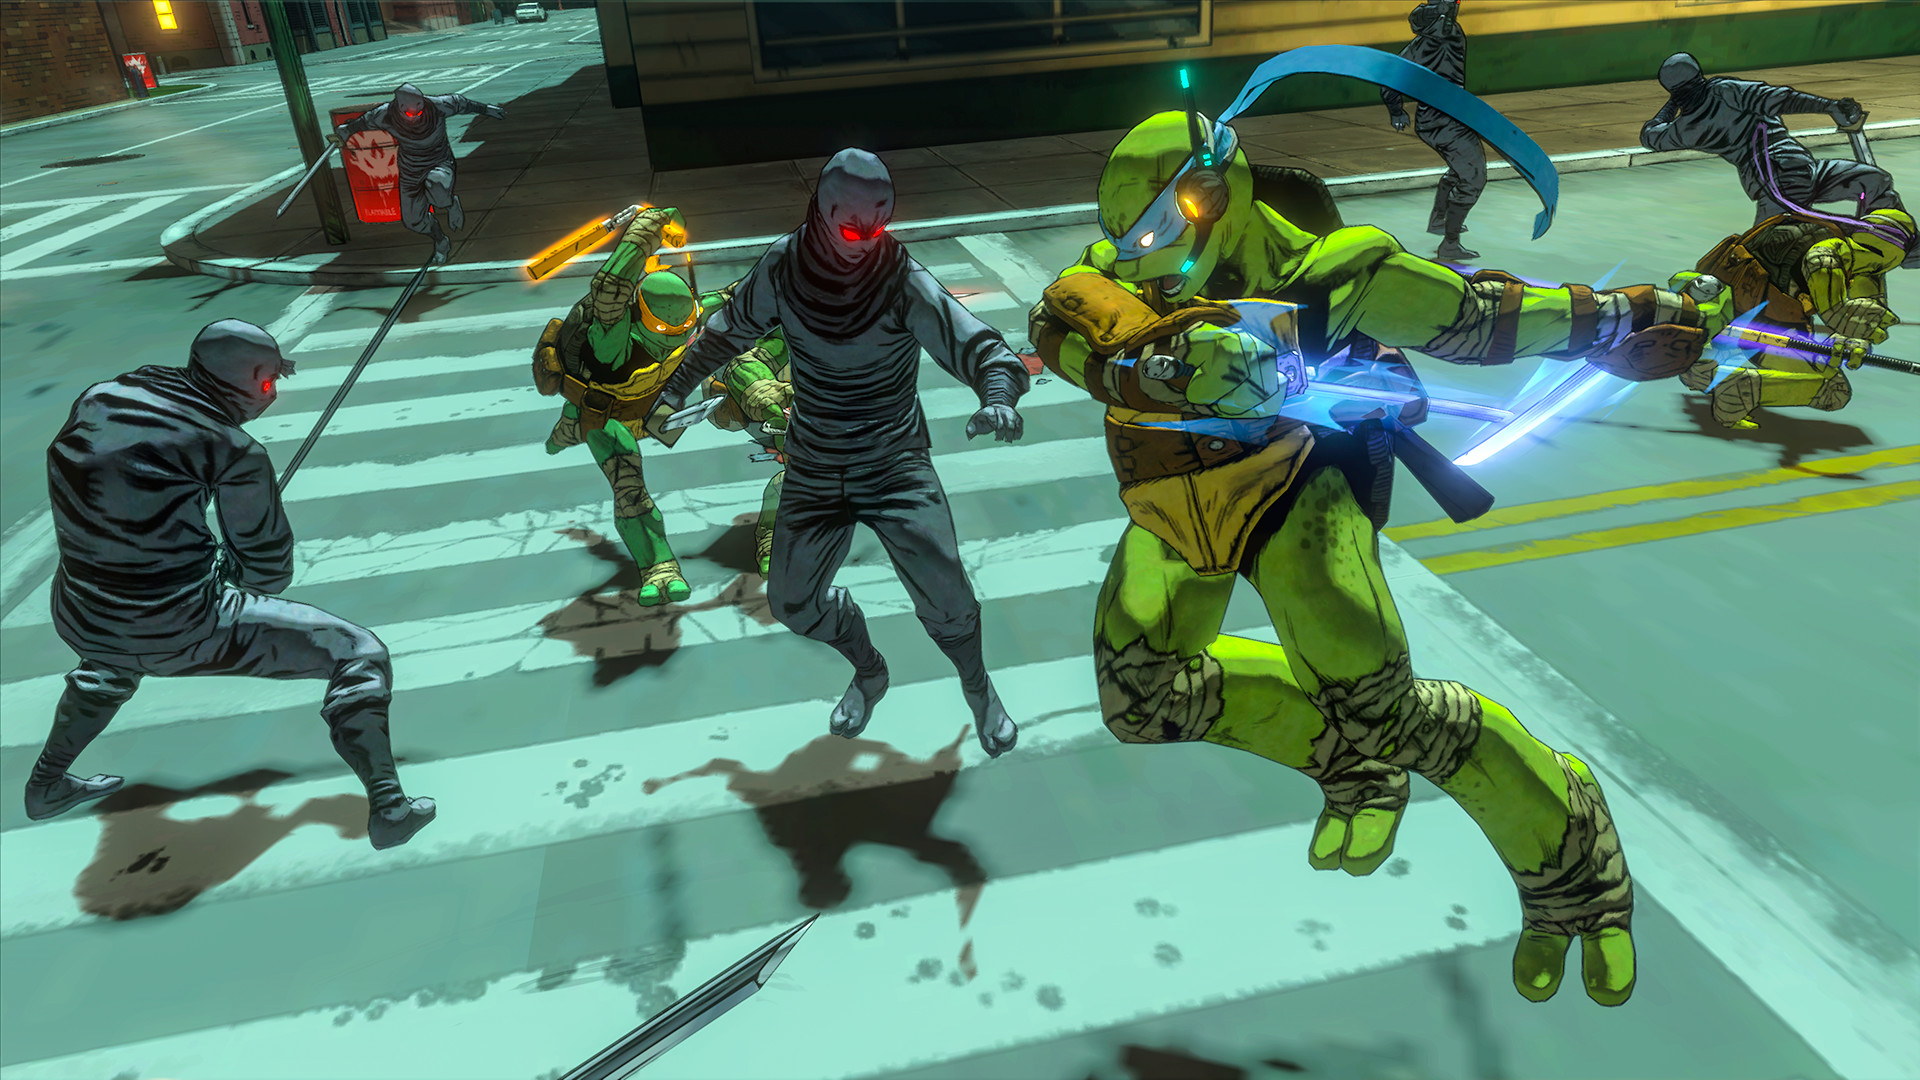 Teenage Mutant Ninja Turtles: Mutants in Manhattan Screenshot 3